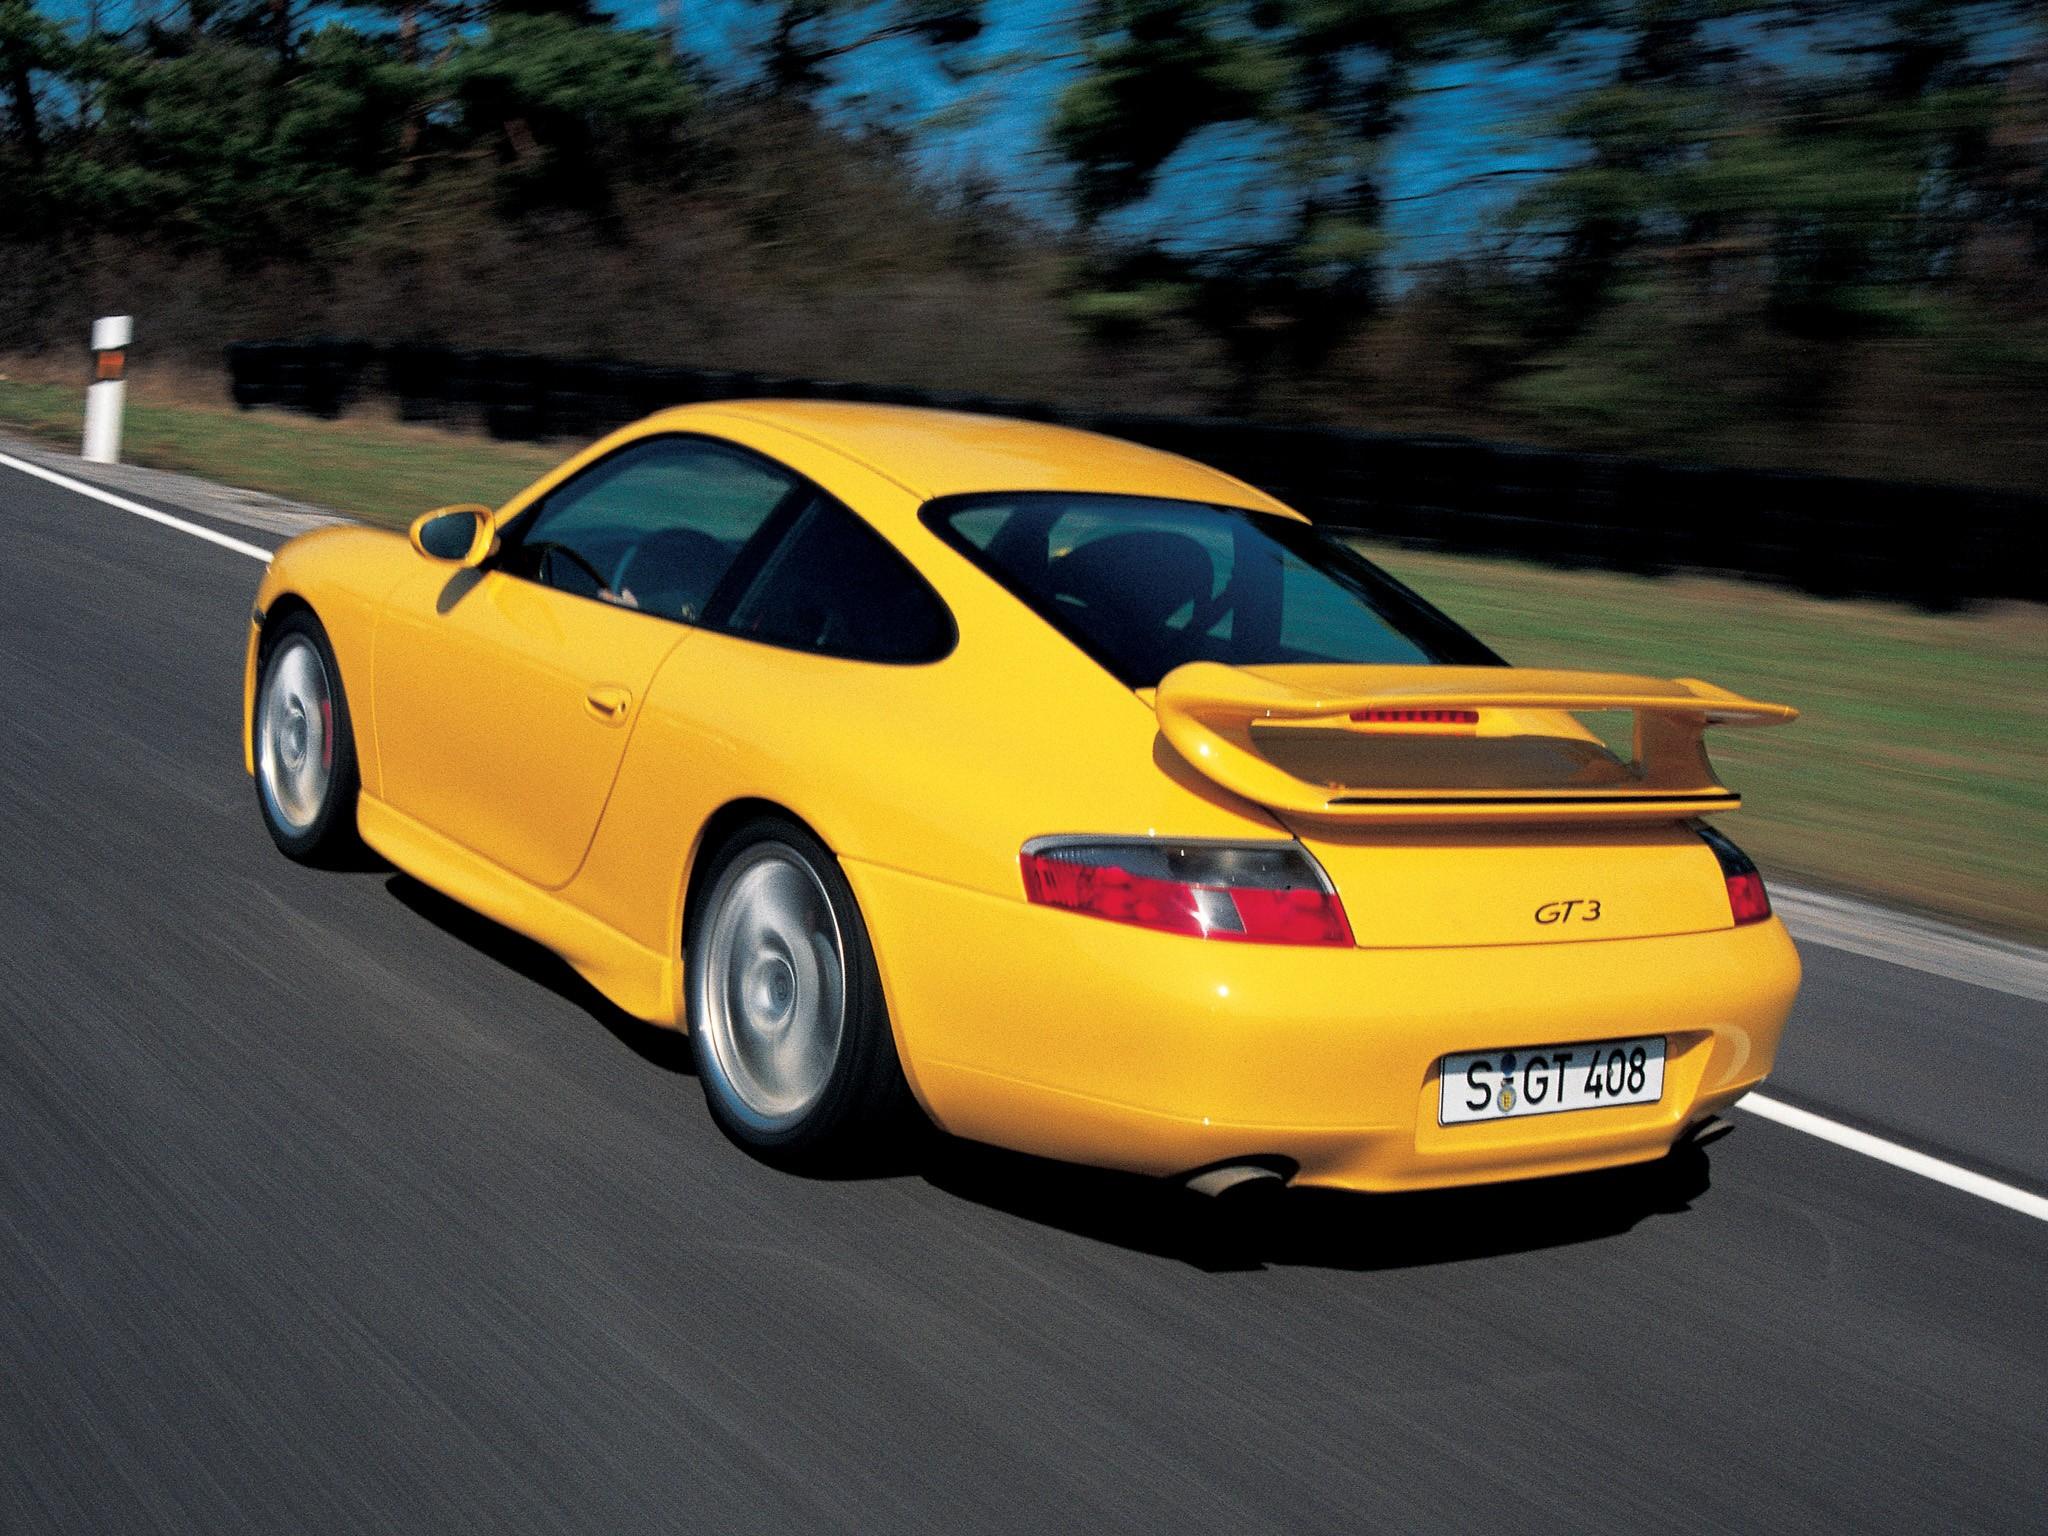 Porsche 996 Turbo >> PORSCHE 911 GT3 (996) specs & photos - 1999, 2000, 2001 - autoevolution